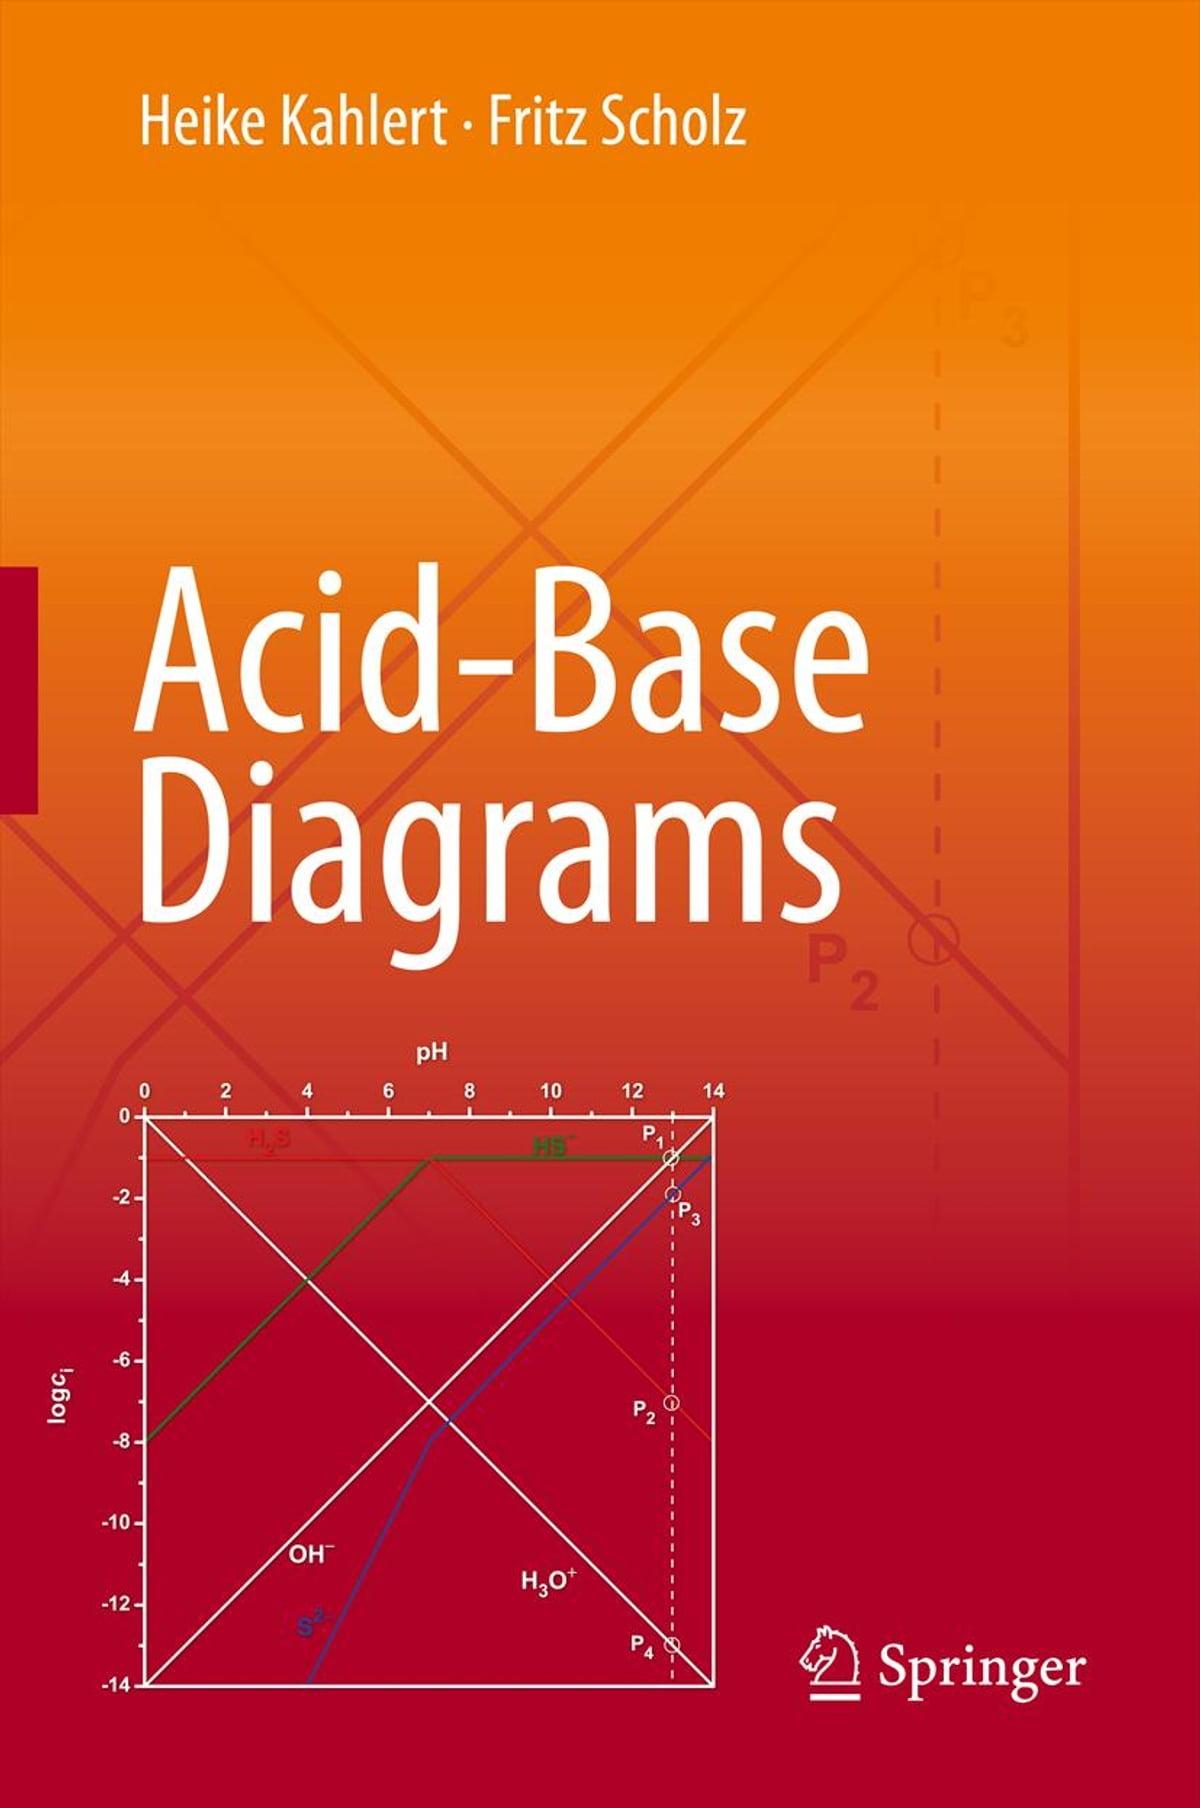 hight resolution of acid base diagrams ebook por heike kahlert 9783642379024 rakuten kobo